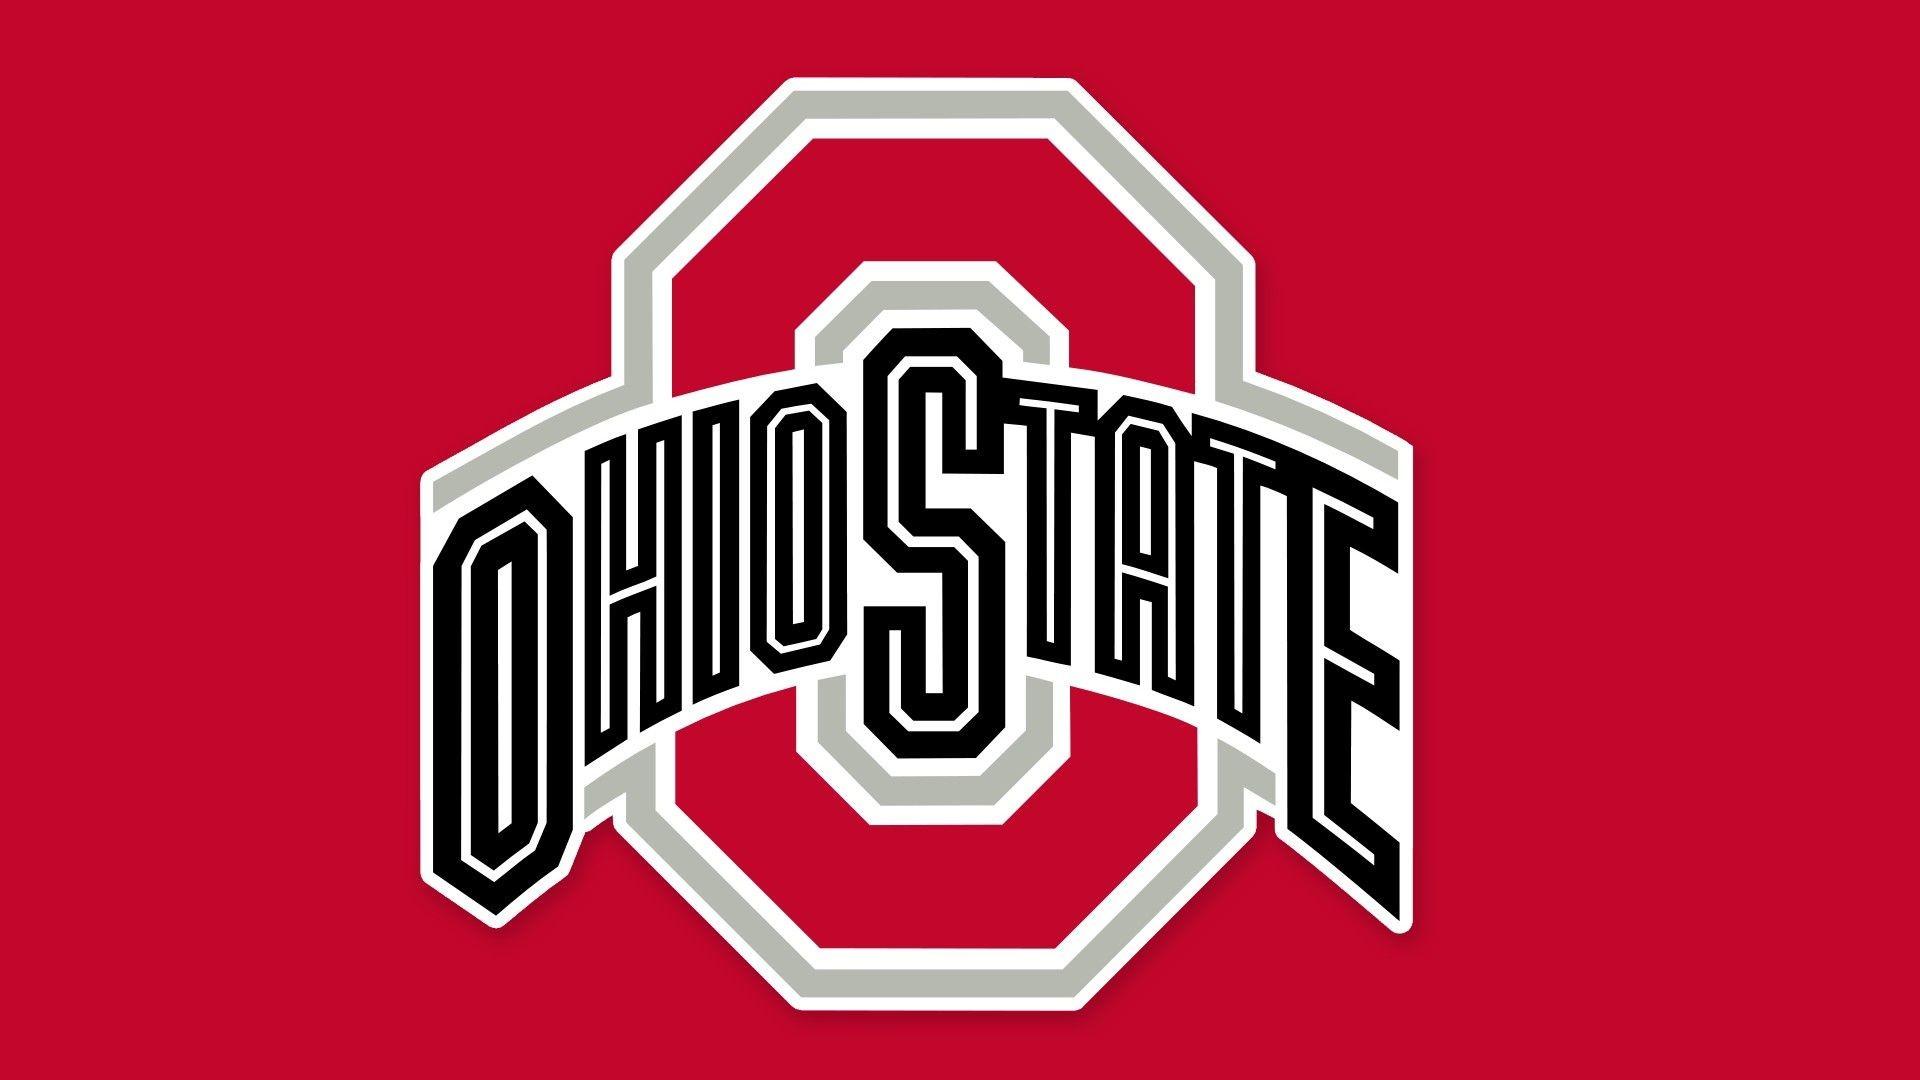 Res: 1920x1080, Ohio State Logo Wallpaper - Best Wallpaper HD